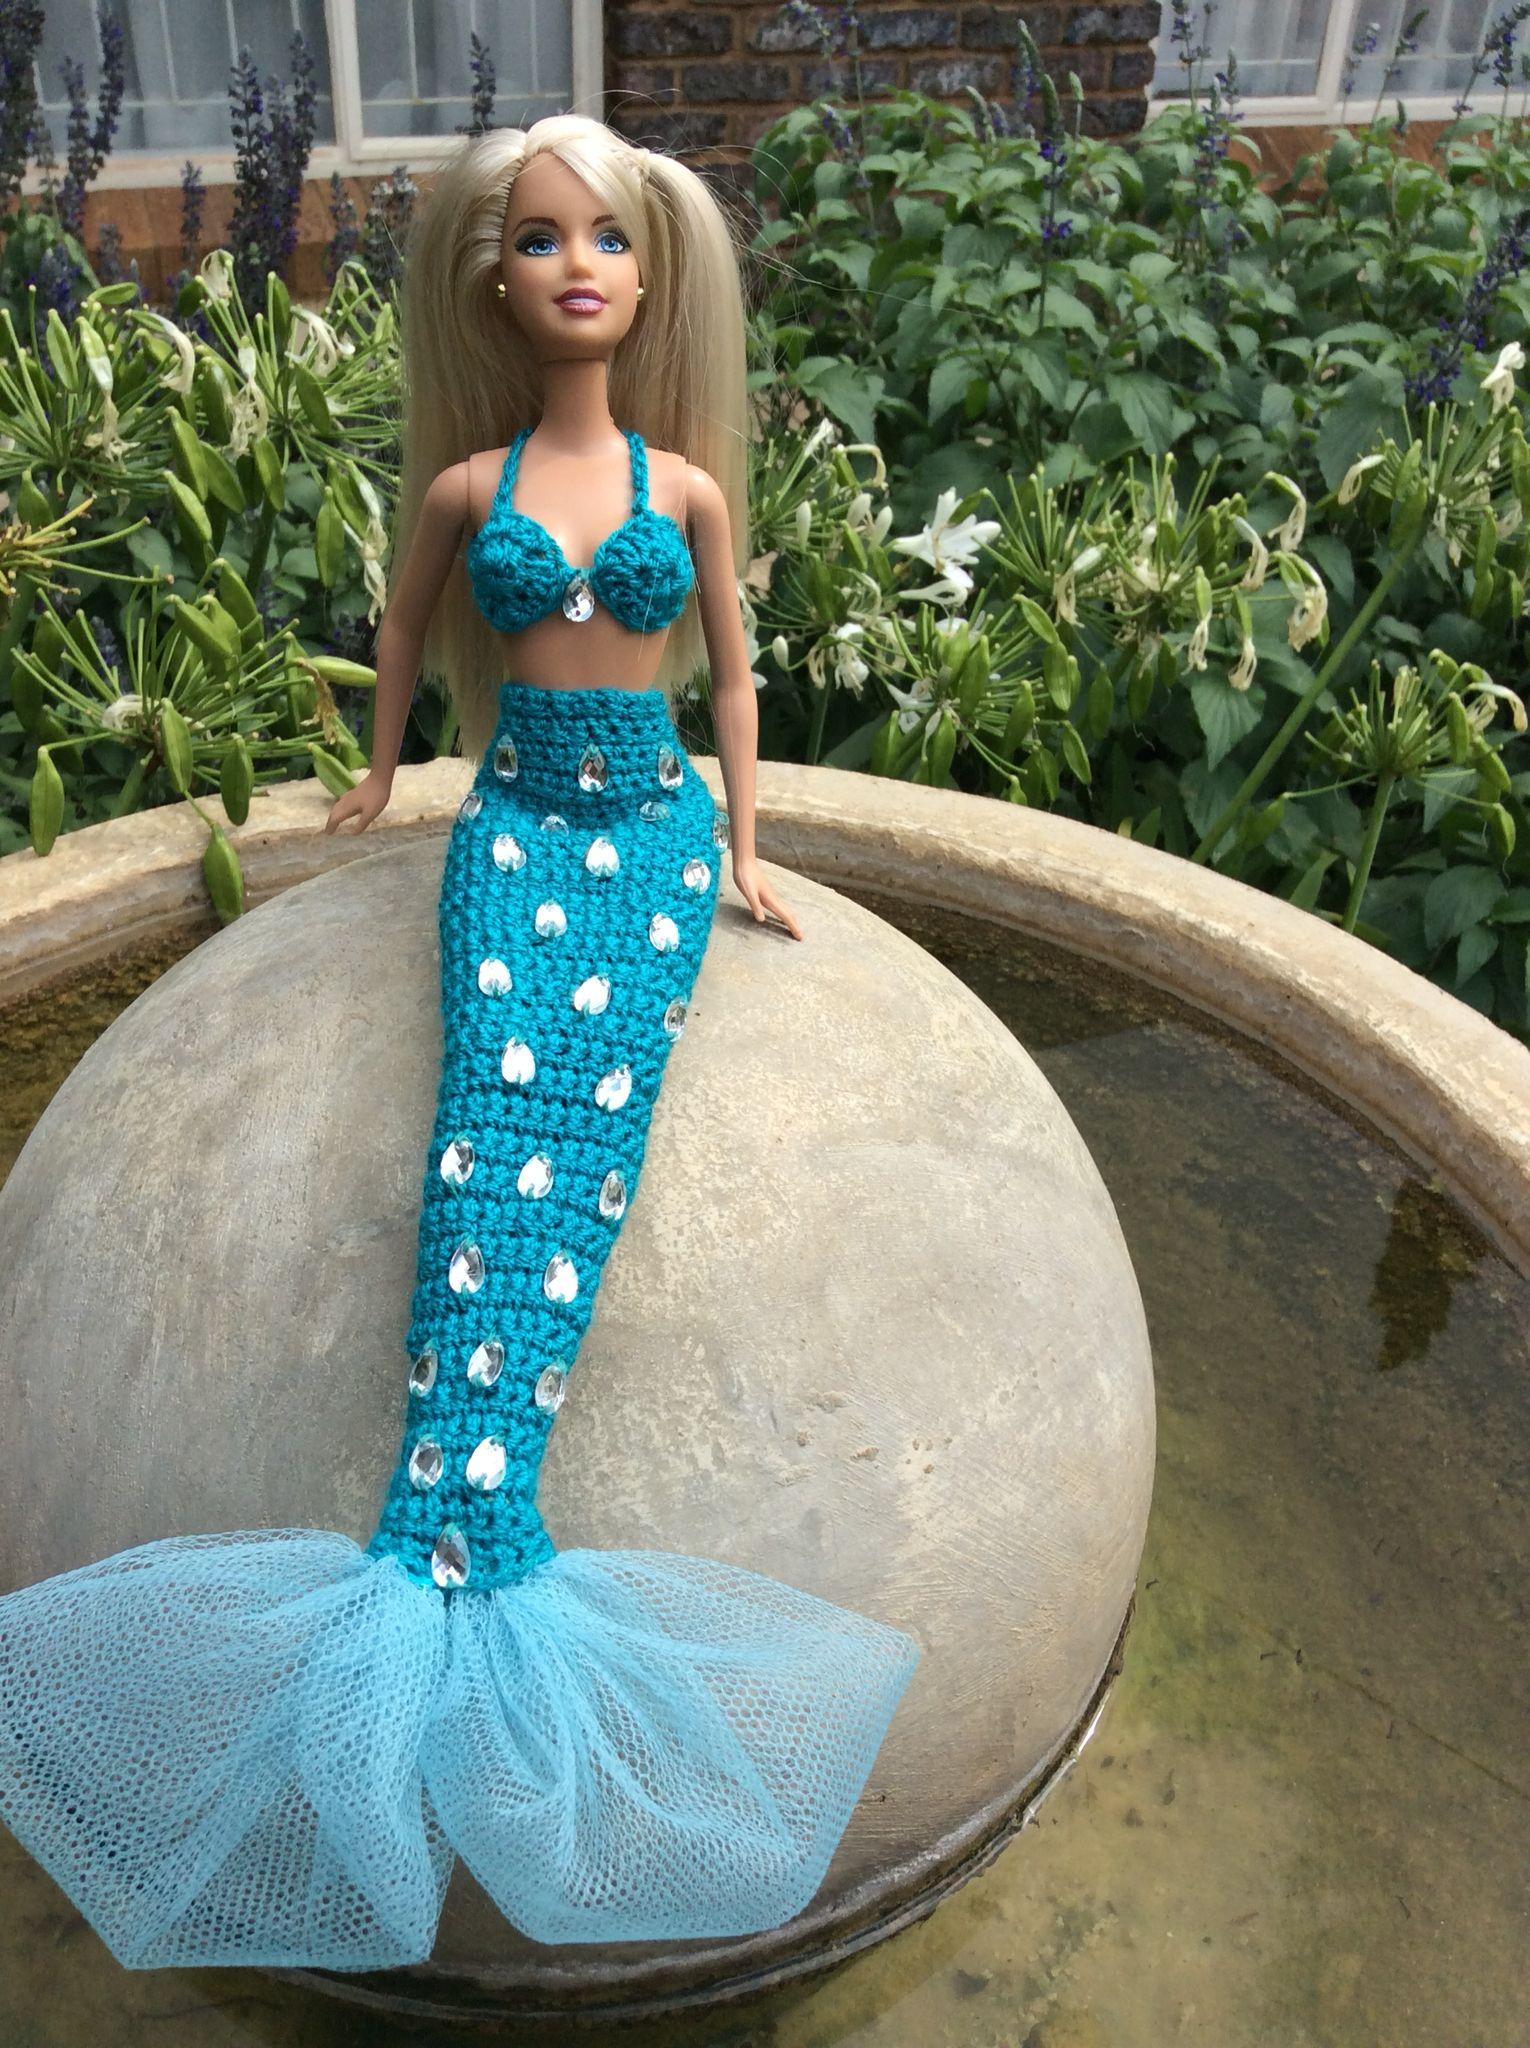 Crochet mermaid Barbie | mini crochet | Pinterest | Barbie sirena ...